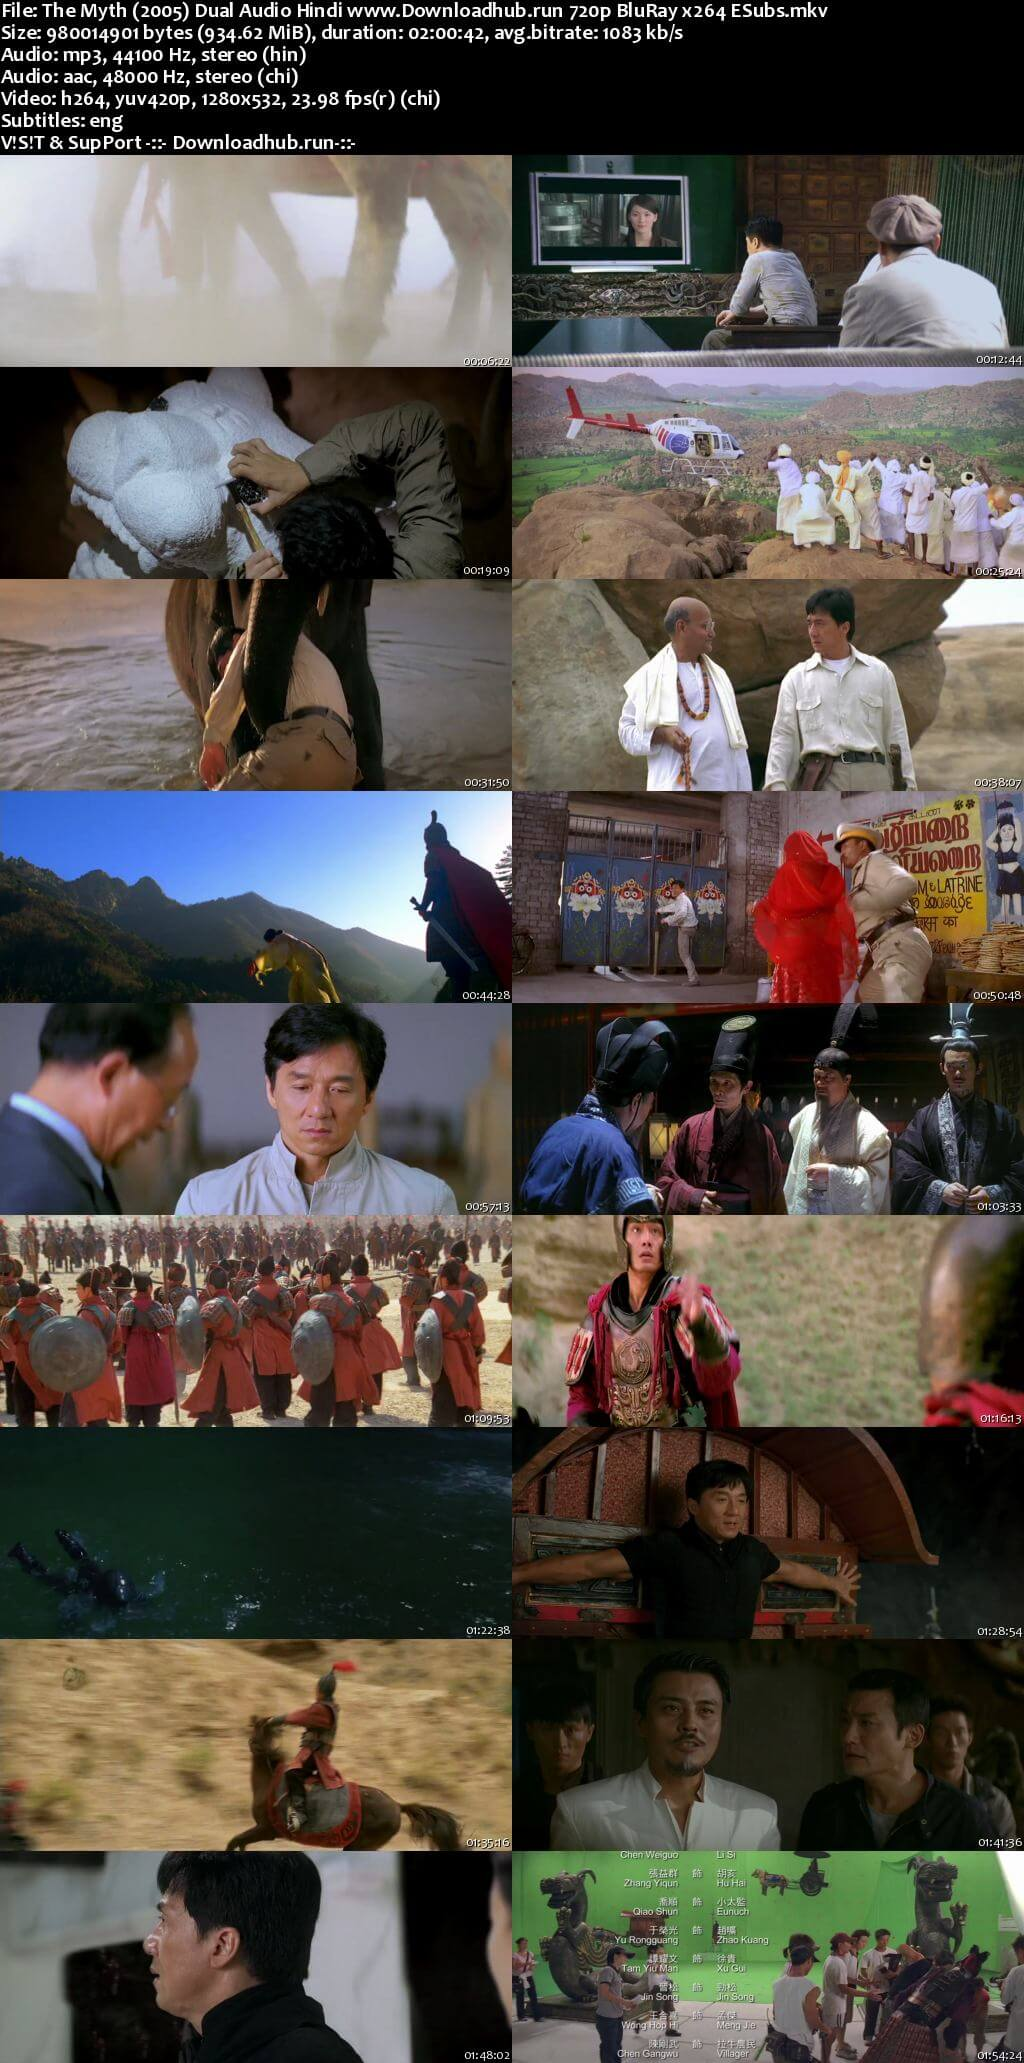 The Myth 2005 Hindi Dual Audio 720p BluRay ESubs